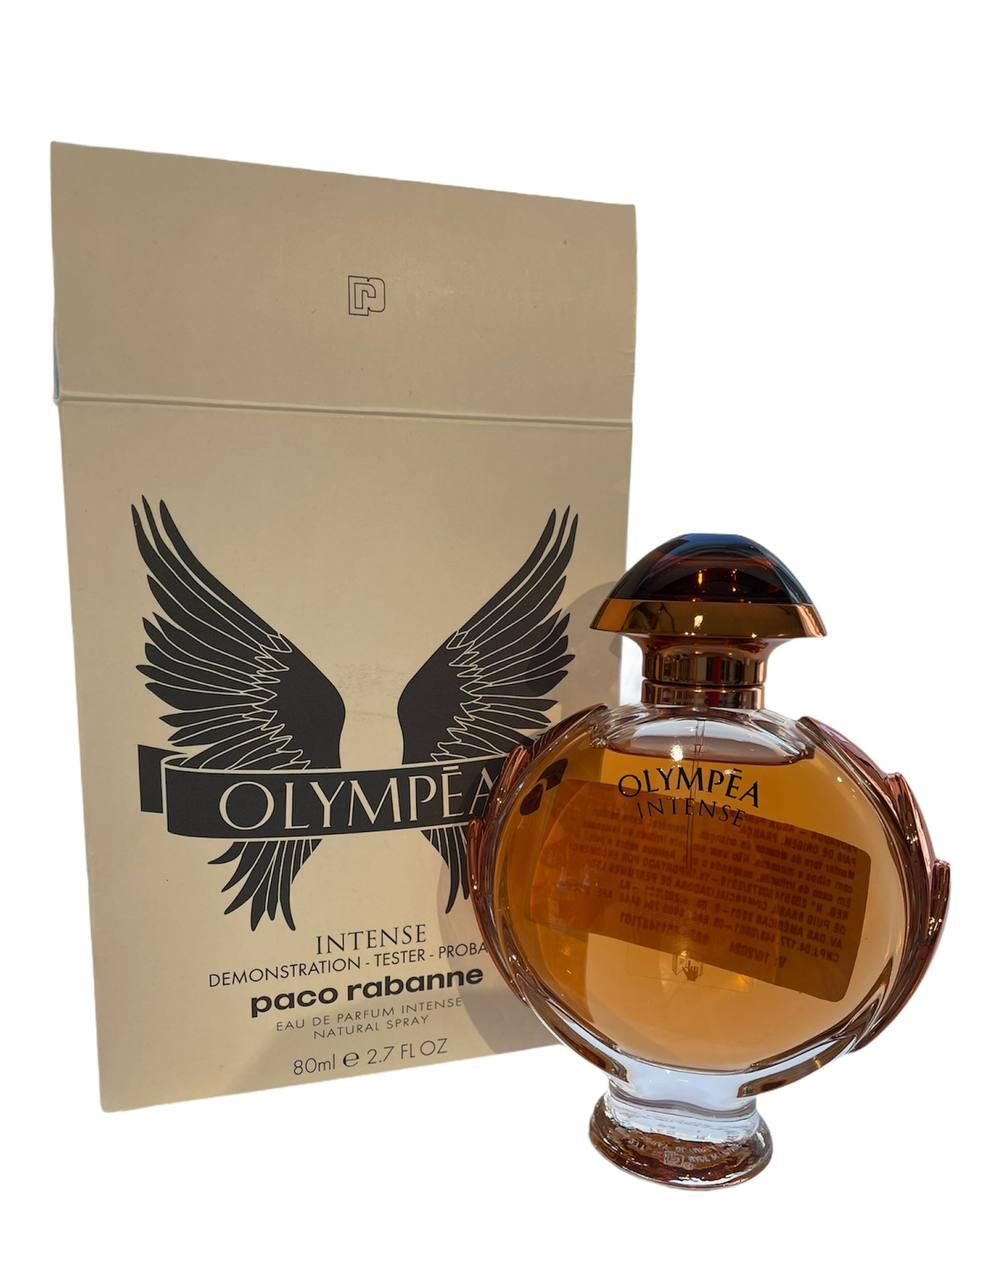 Olympéa Intense Paco Rabanne Feminino Eau de Parfum Tester